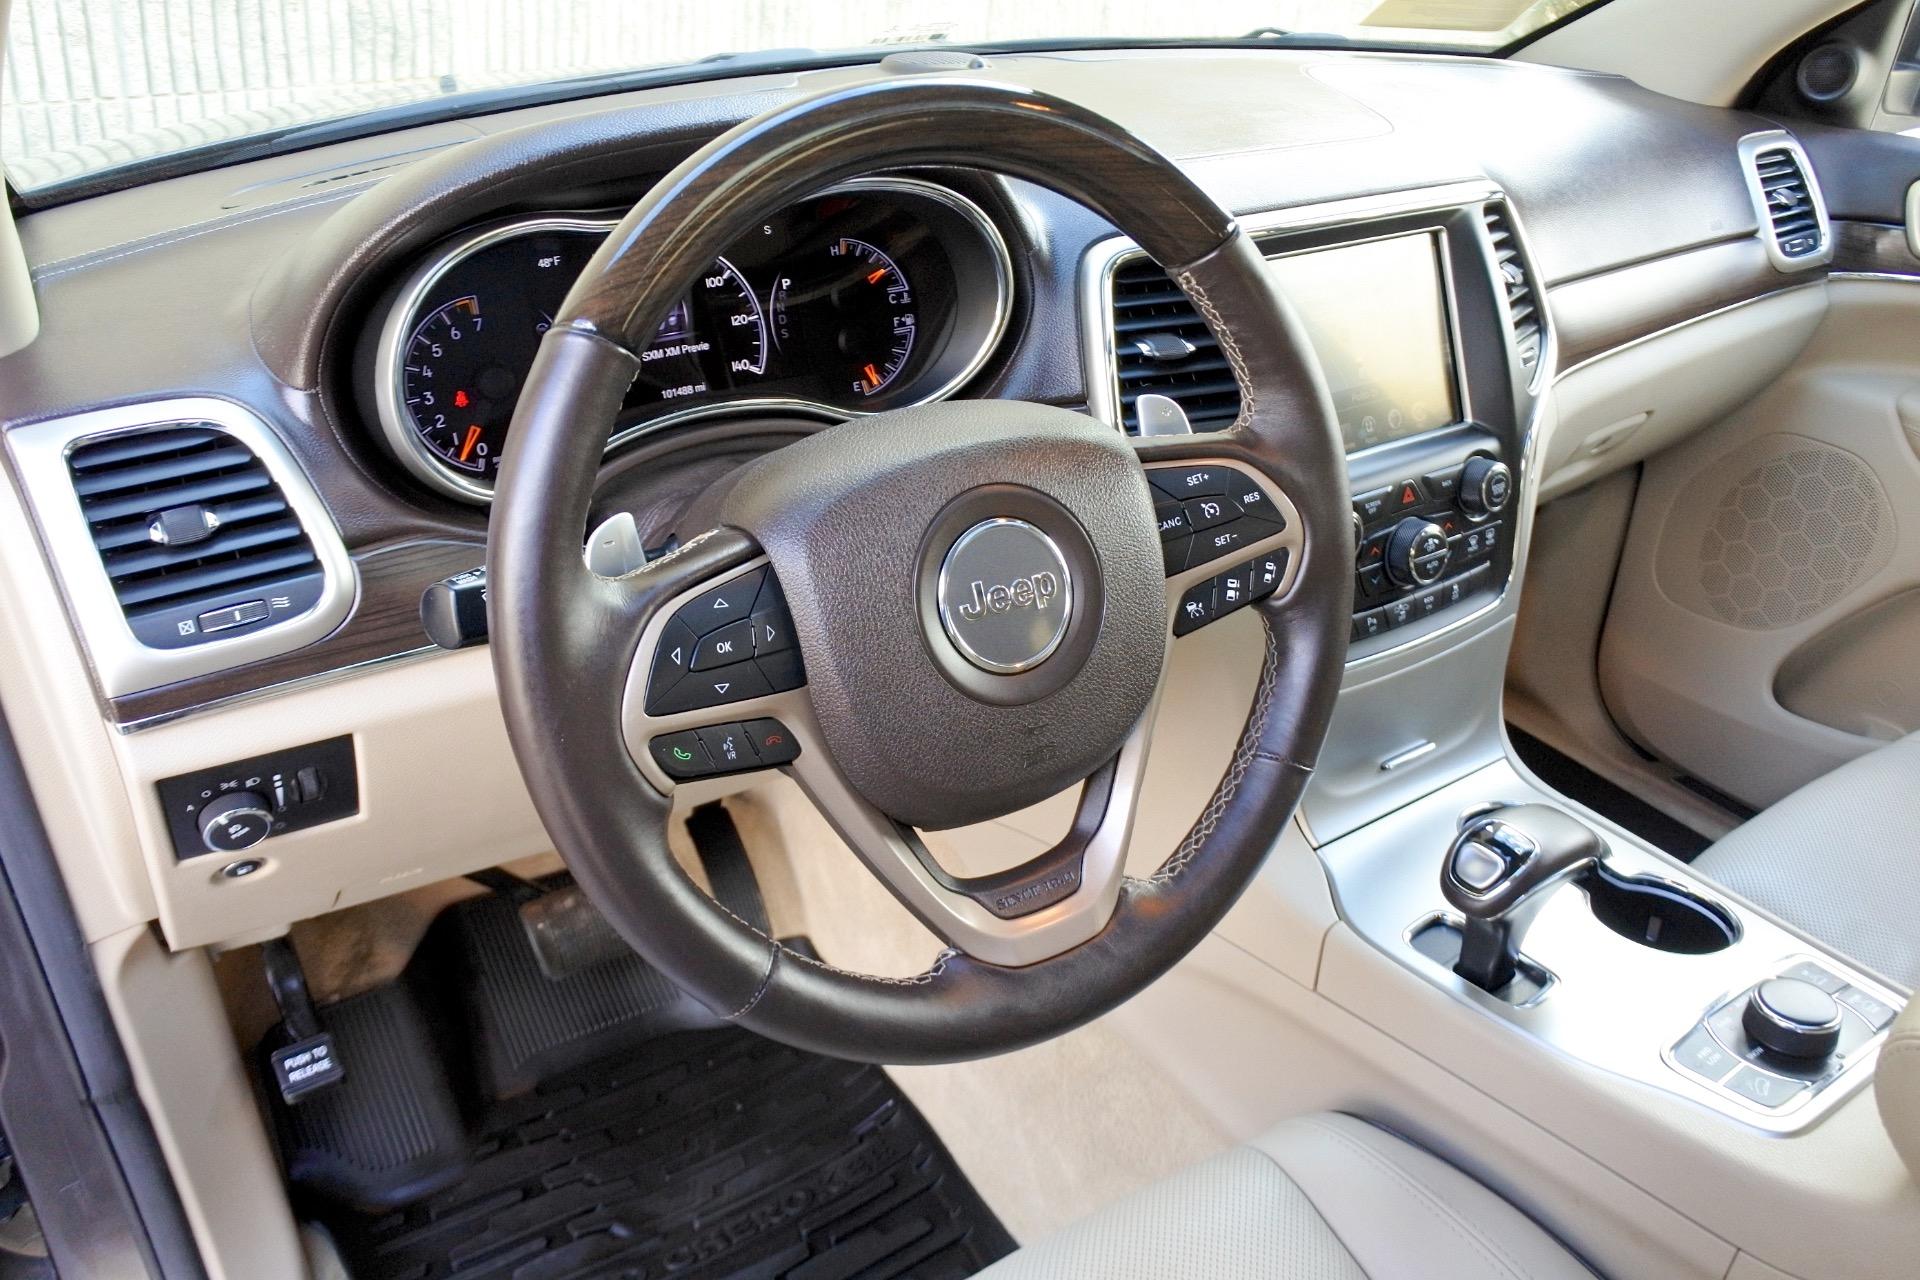 Used 2014 Jeep Grand Cherokee Overland 4WD Used 2014 Jeep Grand Cherokee Overland 4WD for sale  at Metro West Motorcars LLC in Shrewsbury MA 13